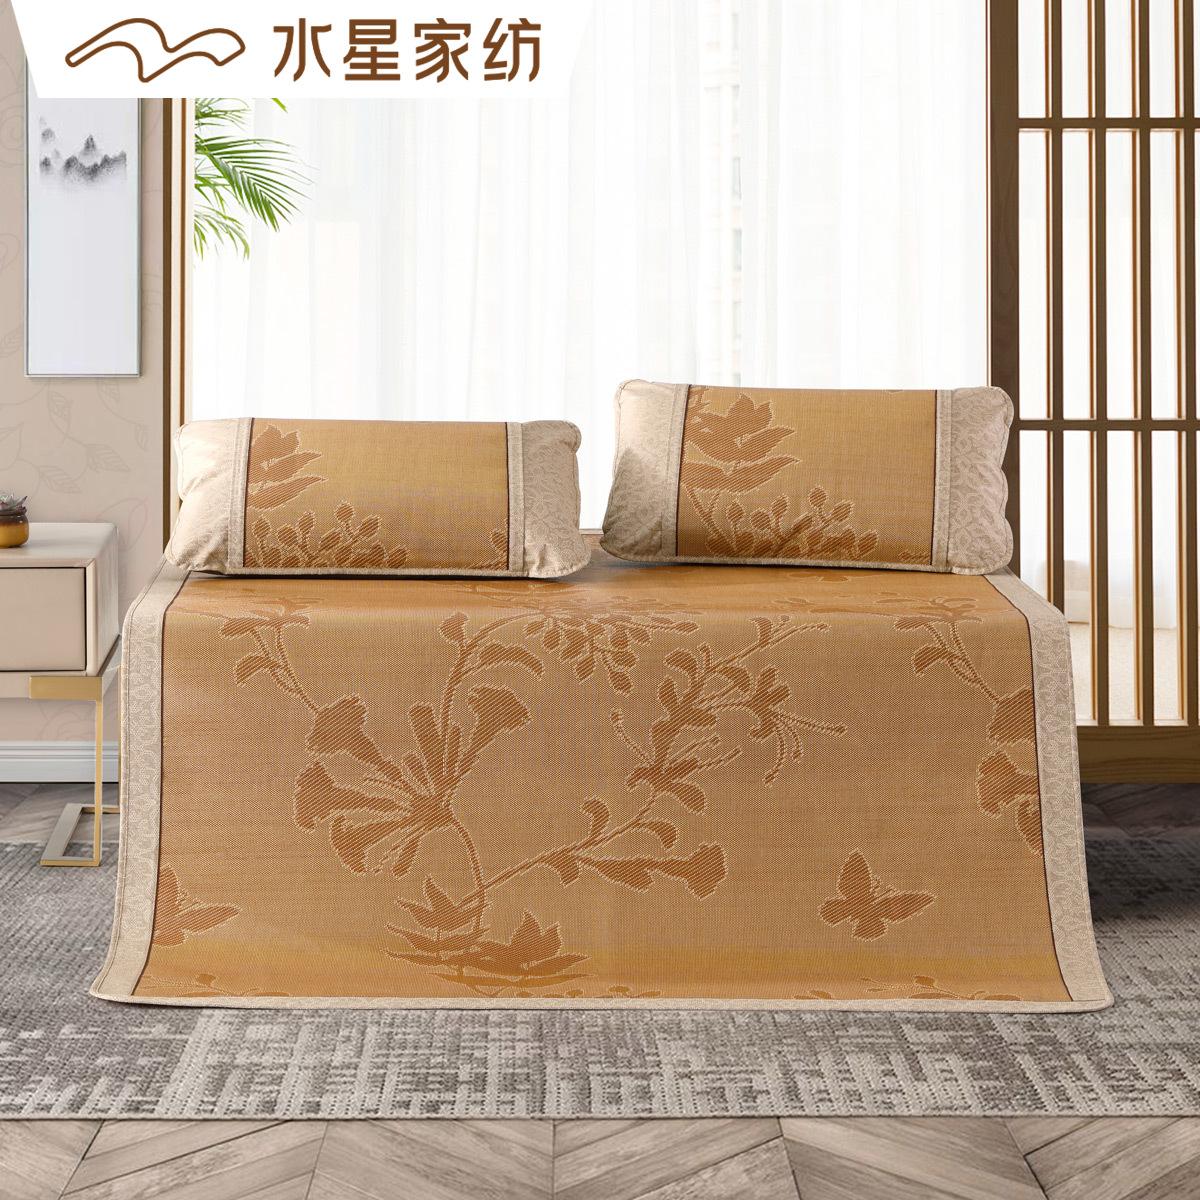 Декоративные одеяла и подушки / Прикроватные коврики Артикул 615721317250